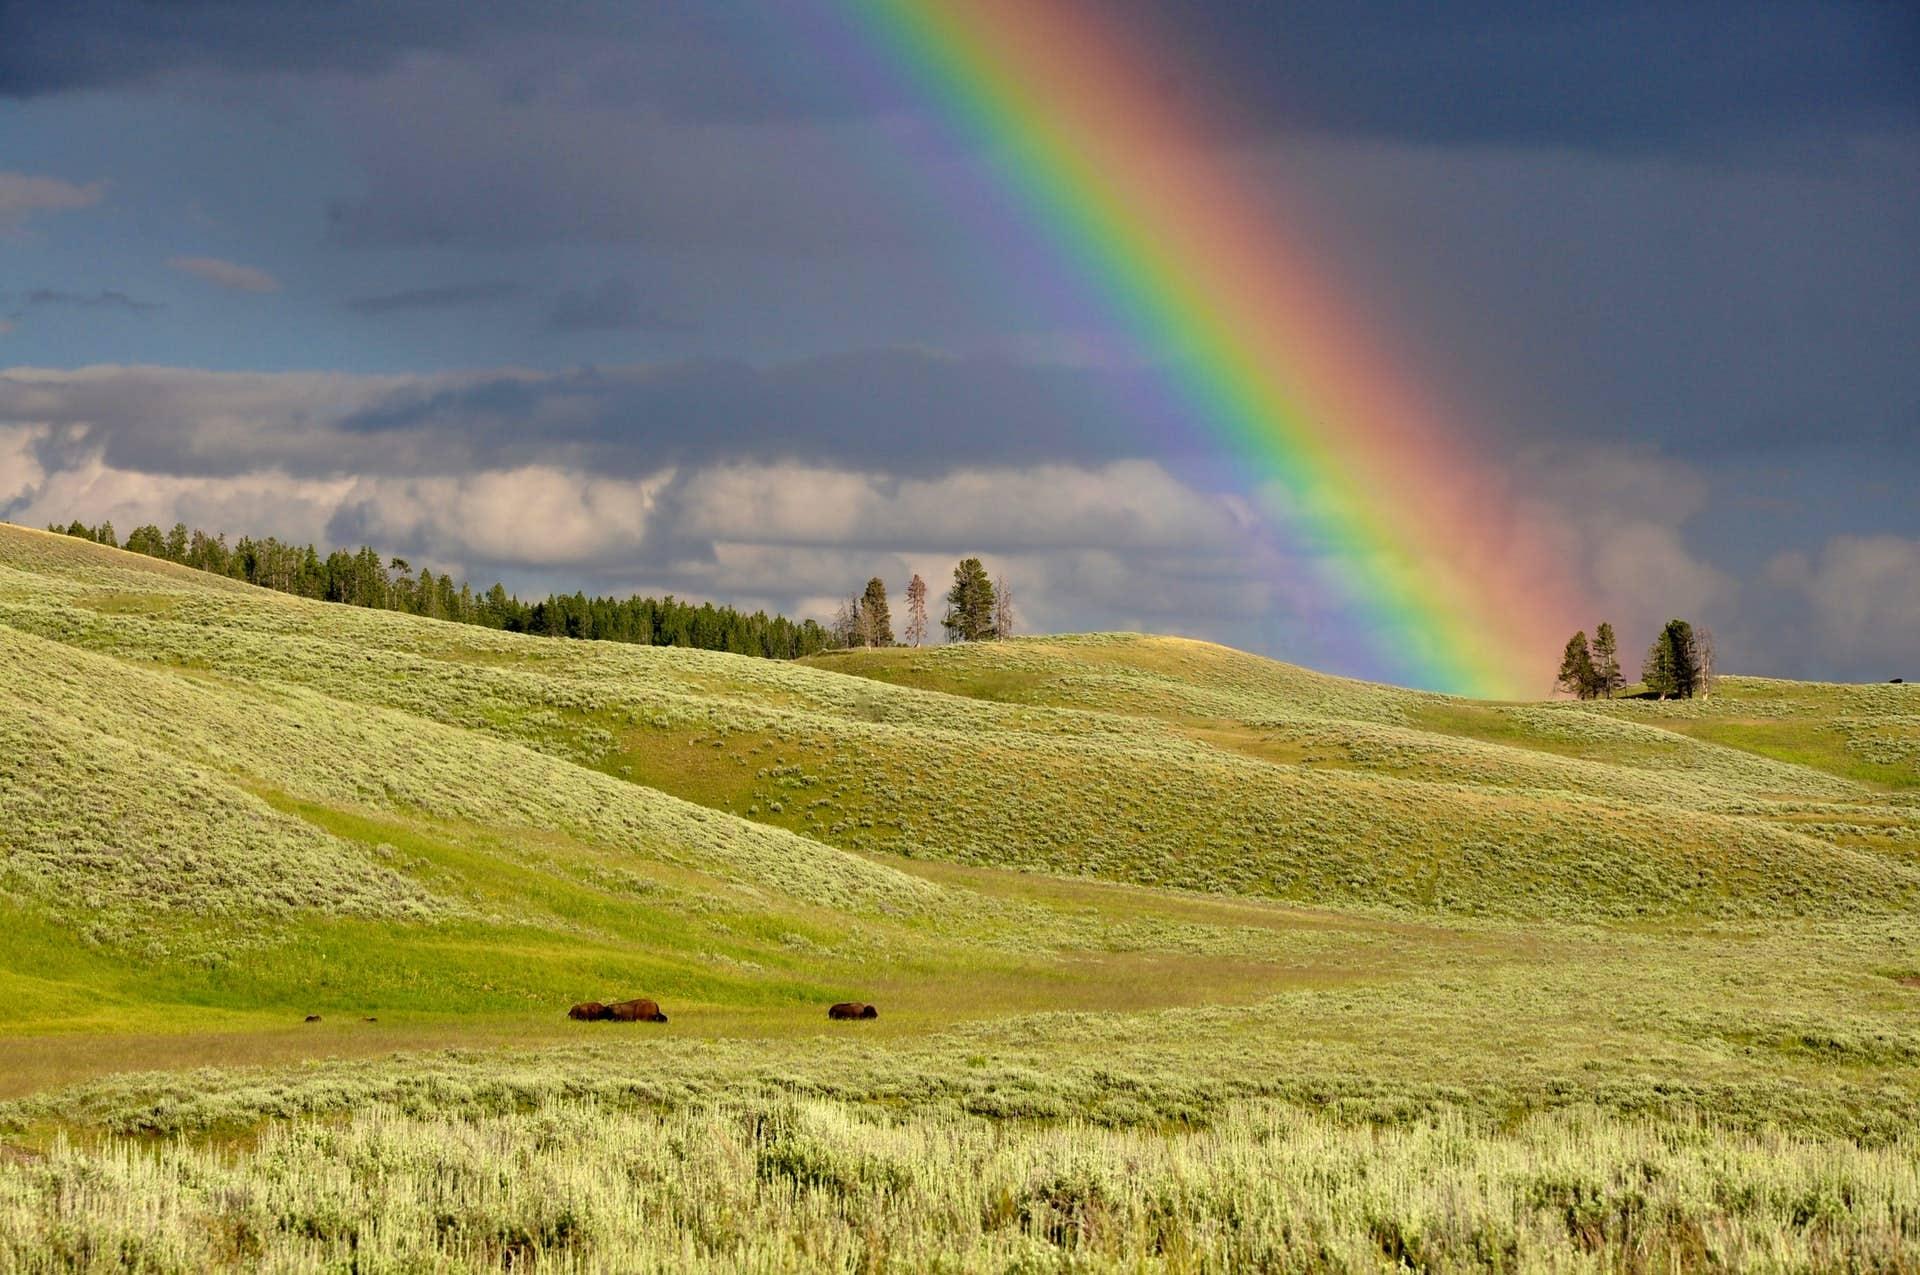 rainbow-over-field